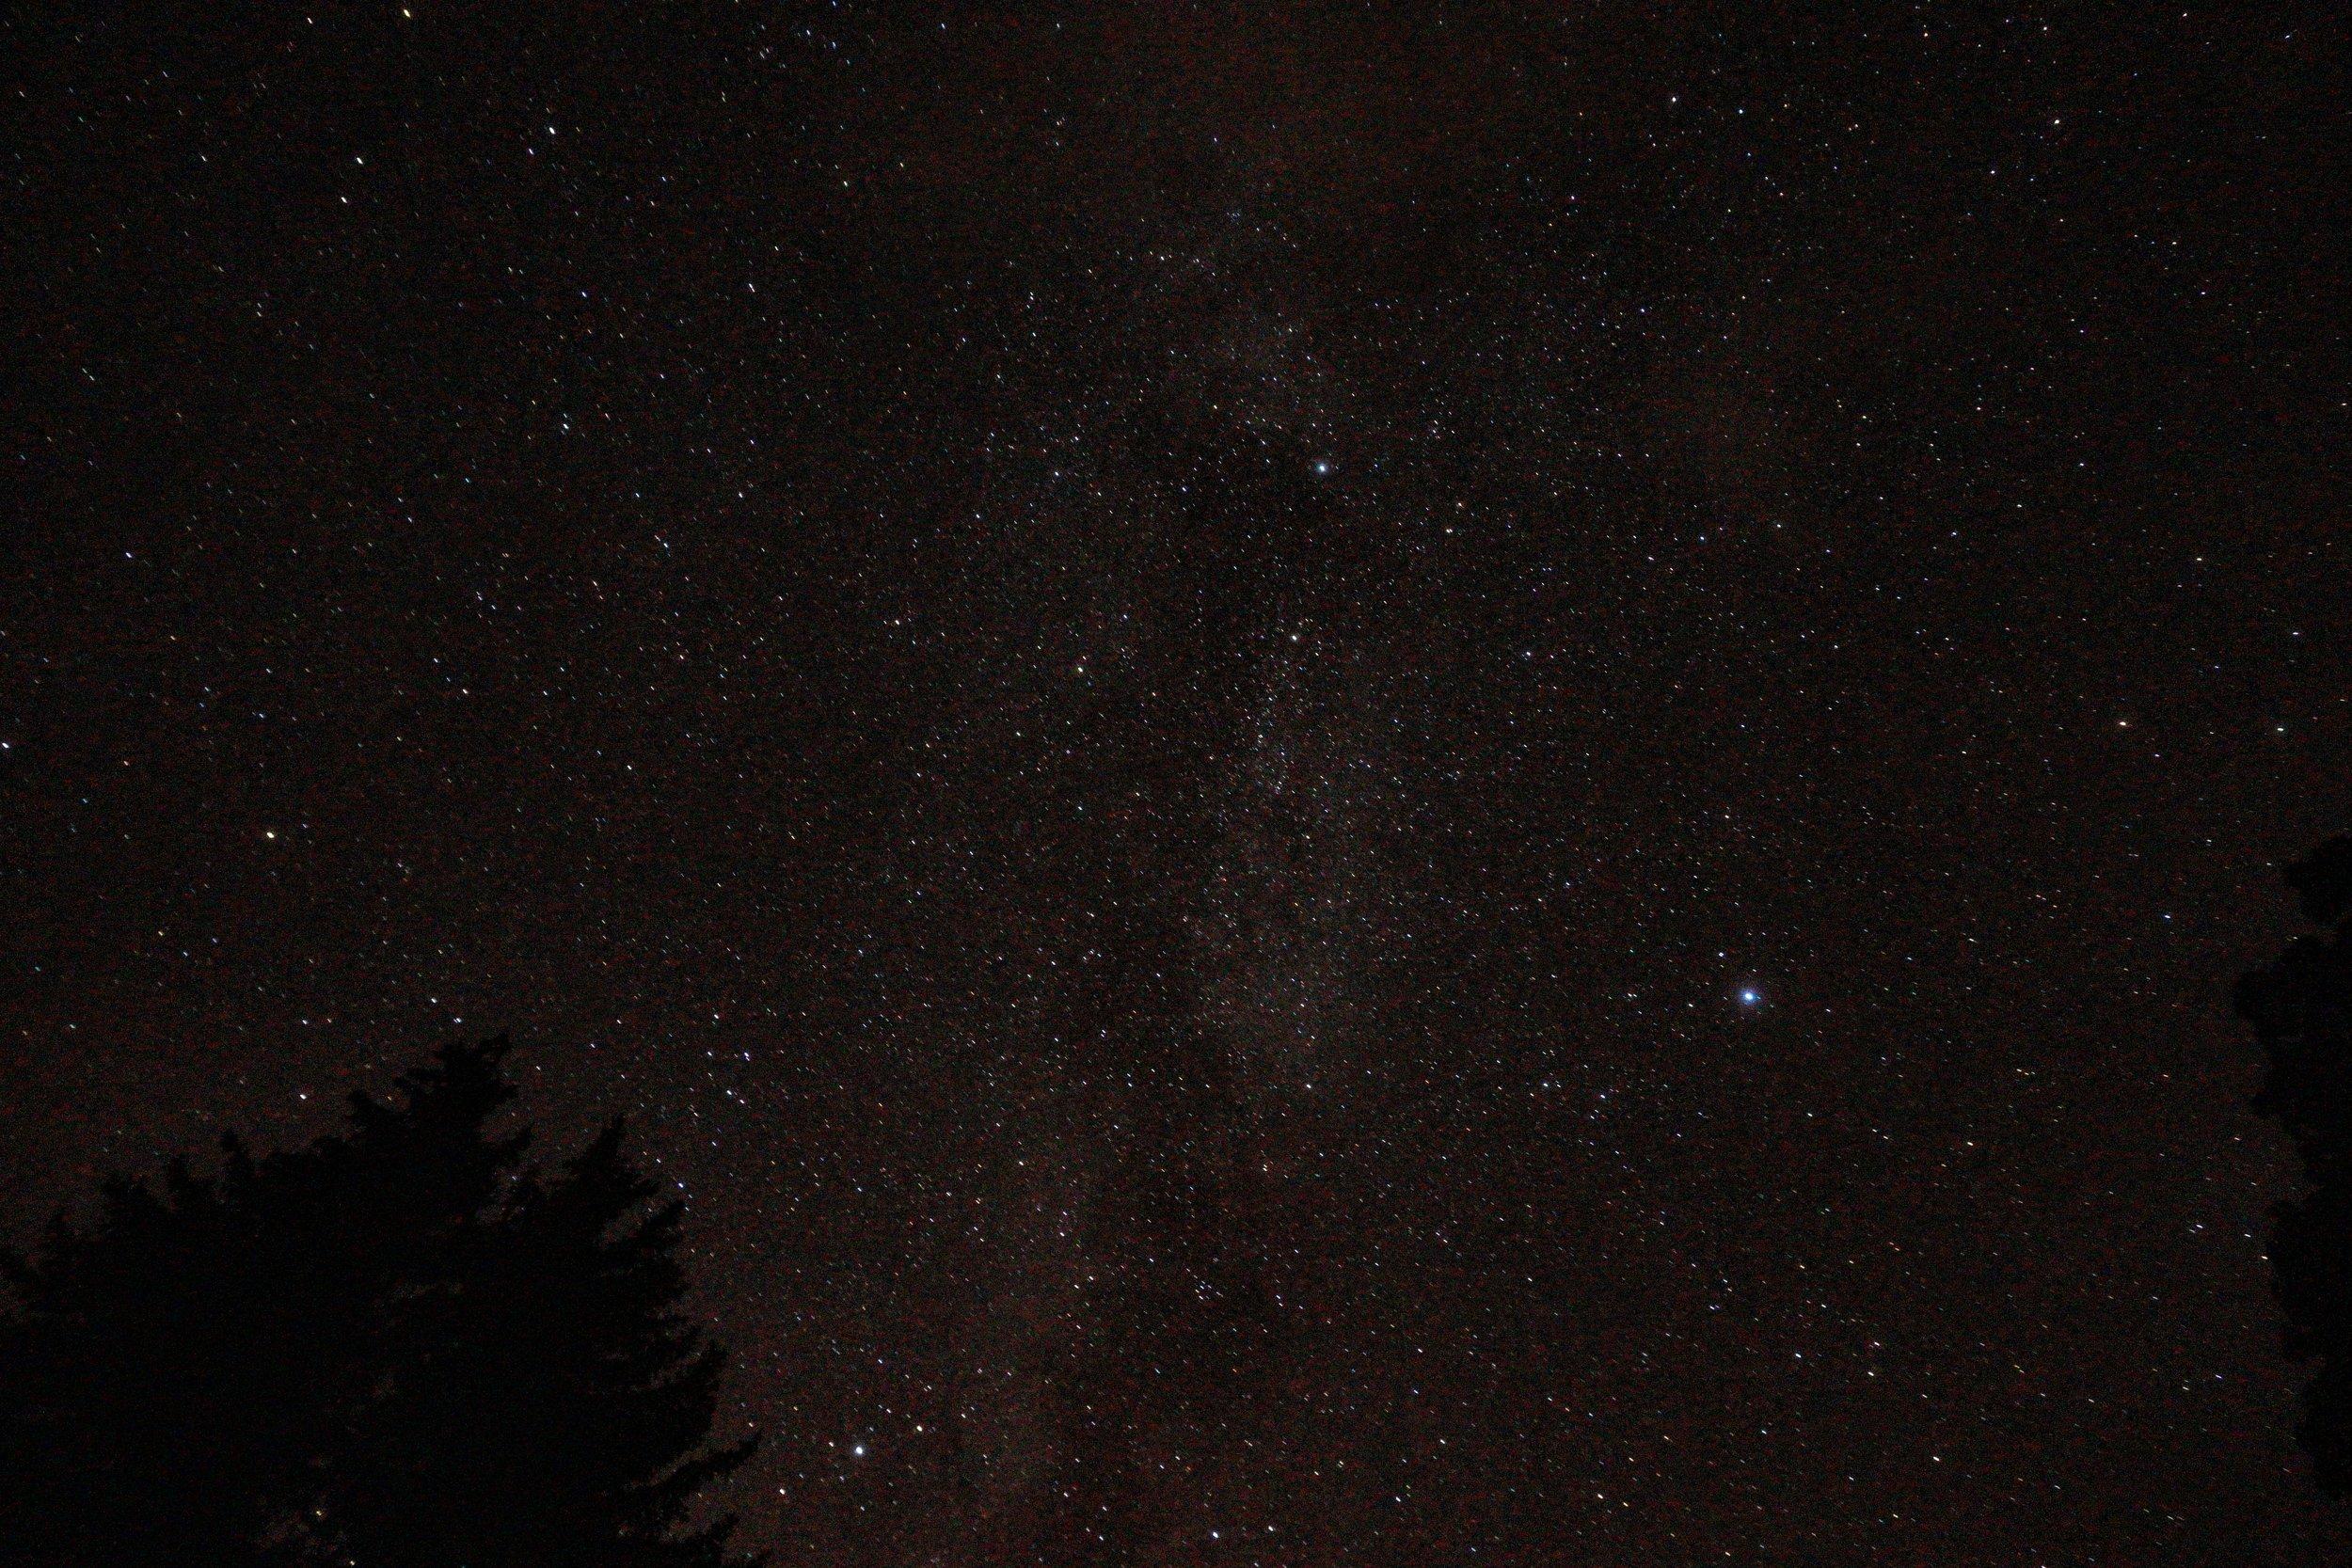 Stargazing at Bridgeport State Park